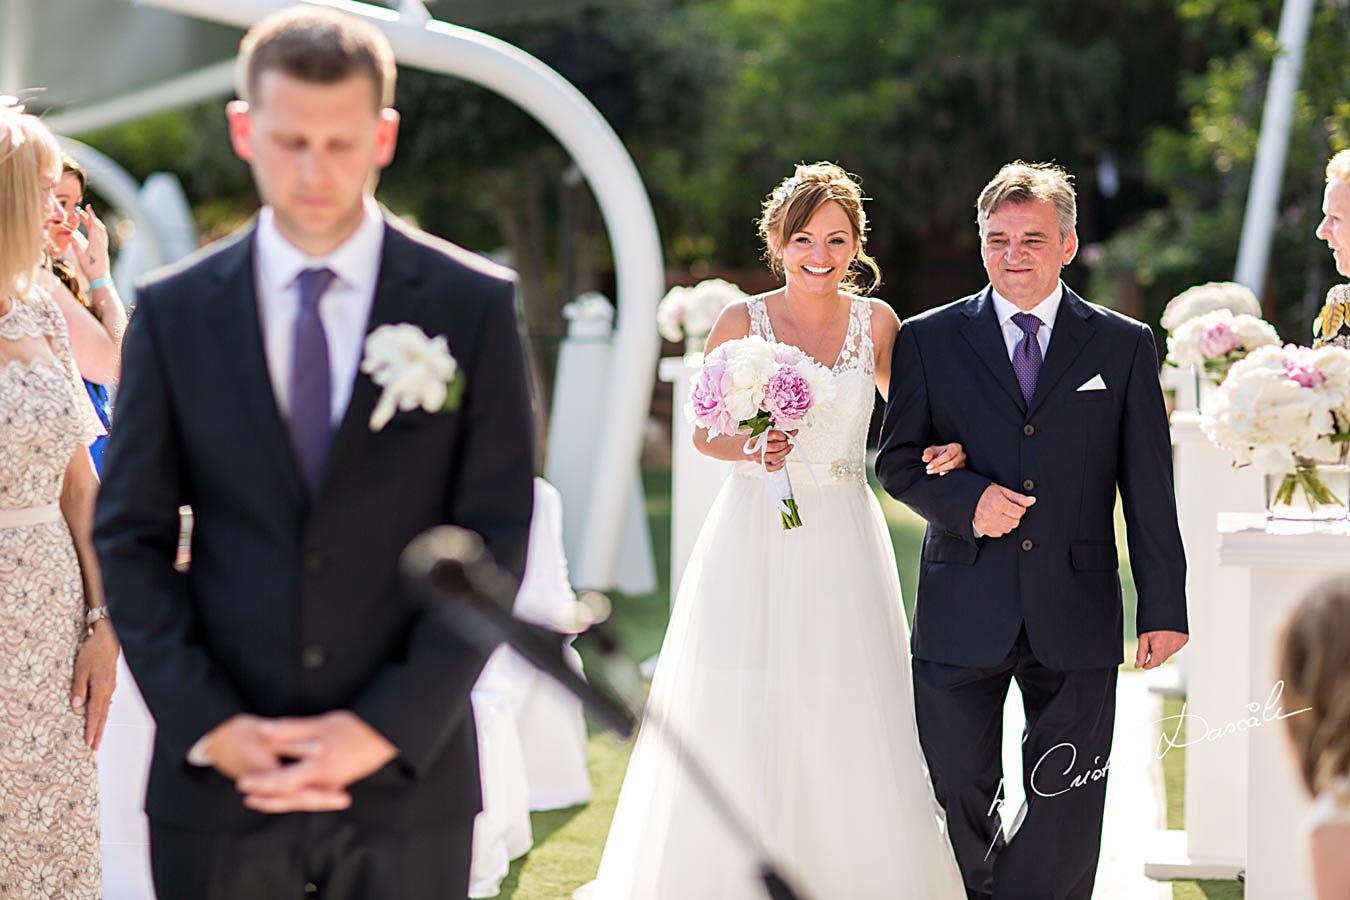 Wedding at Grecian Park Hotel in Protaras, Cyprus. Photographer: Cristian Dascalu